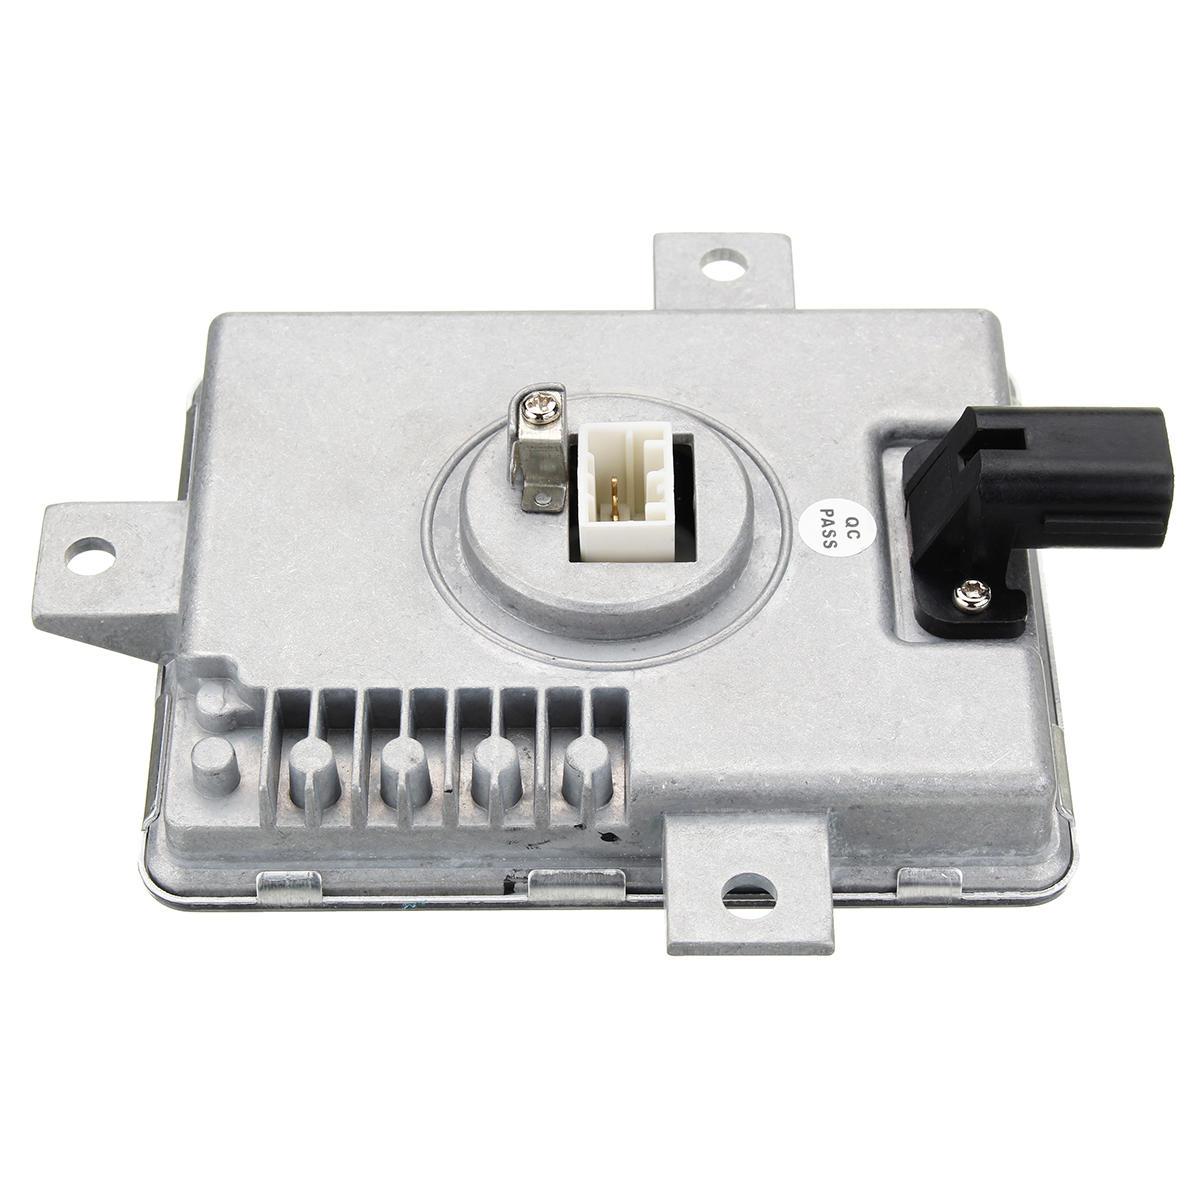 [US$37.49] Xenon Ballast HID Headlight Assembly Unit For